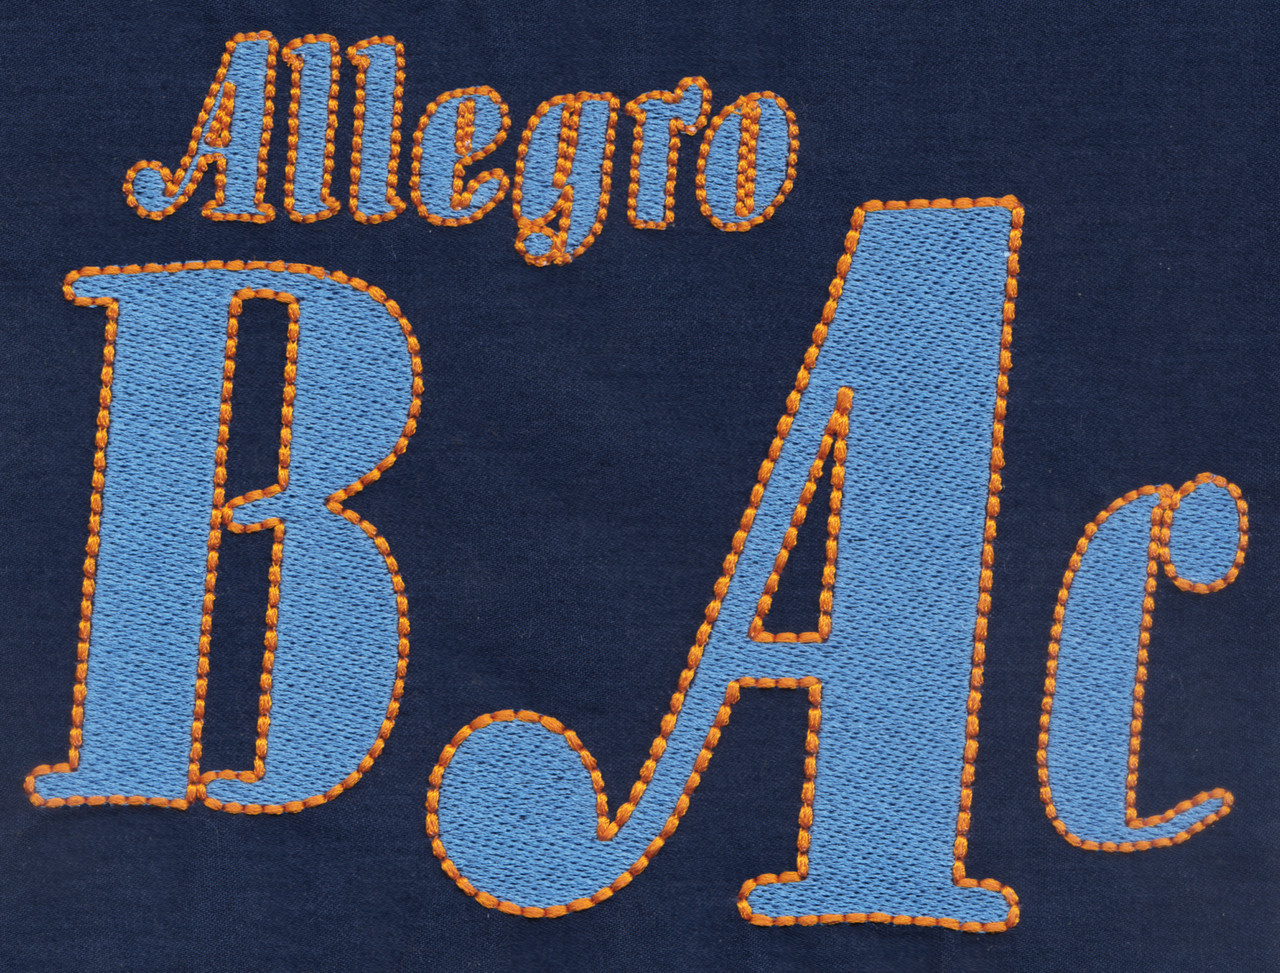 a63f45a065241f 714 Allegro Fill   Floss Font - Jolson s Designs